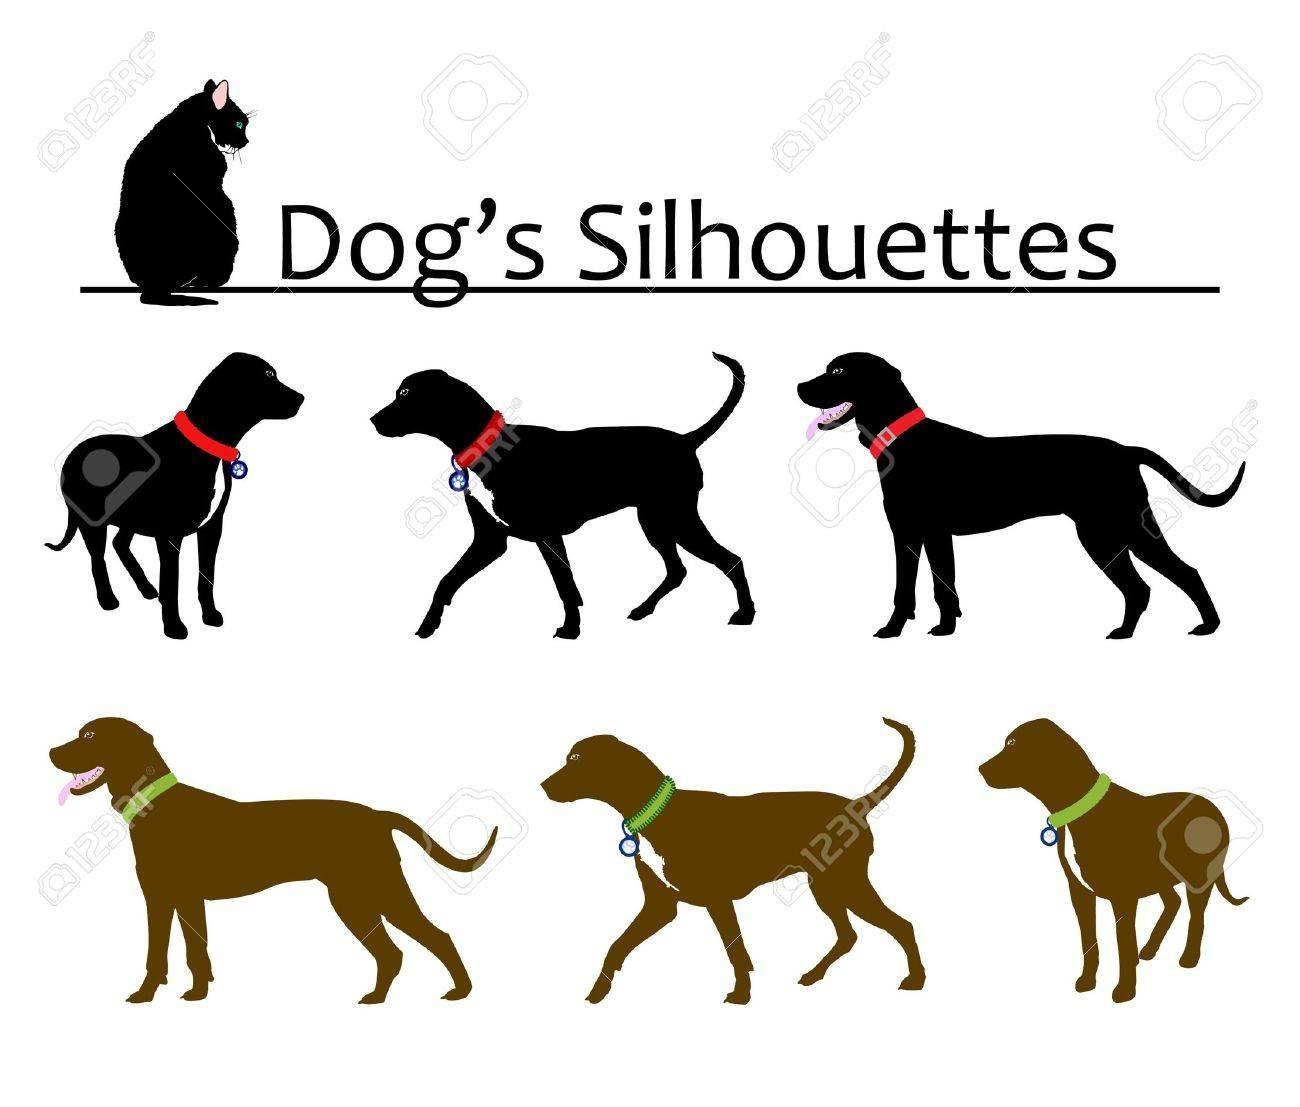 9 416 dog collar stock vector illustration and royalty free dog